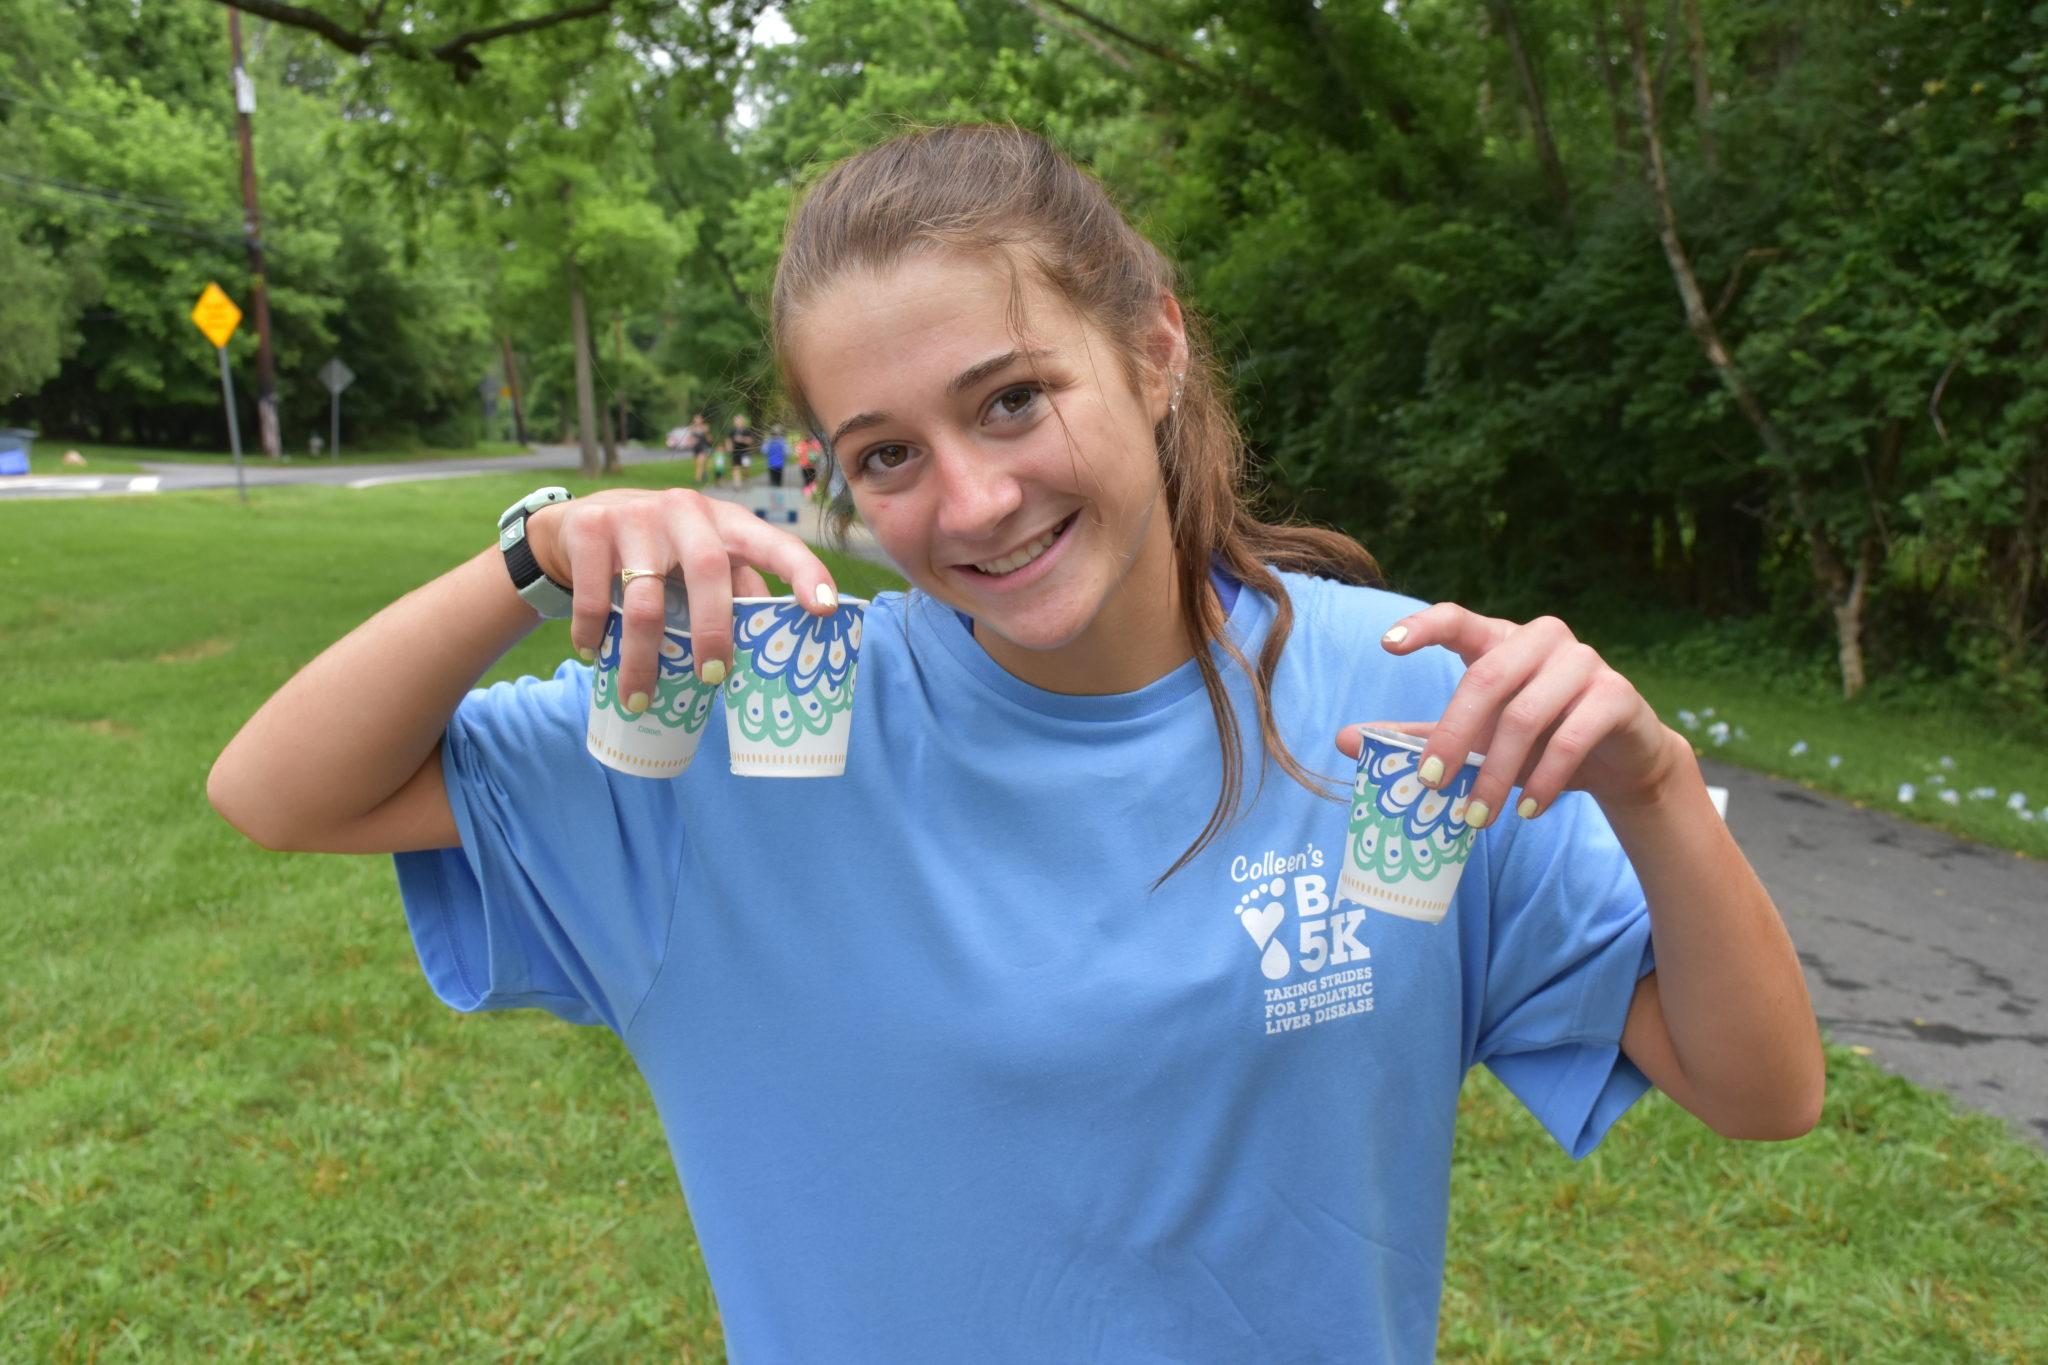 Water Turnaround Caroline